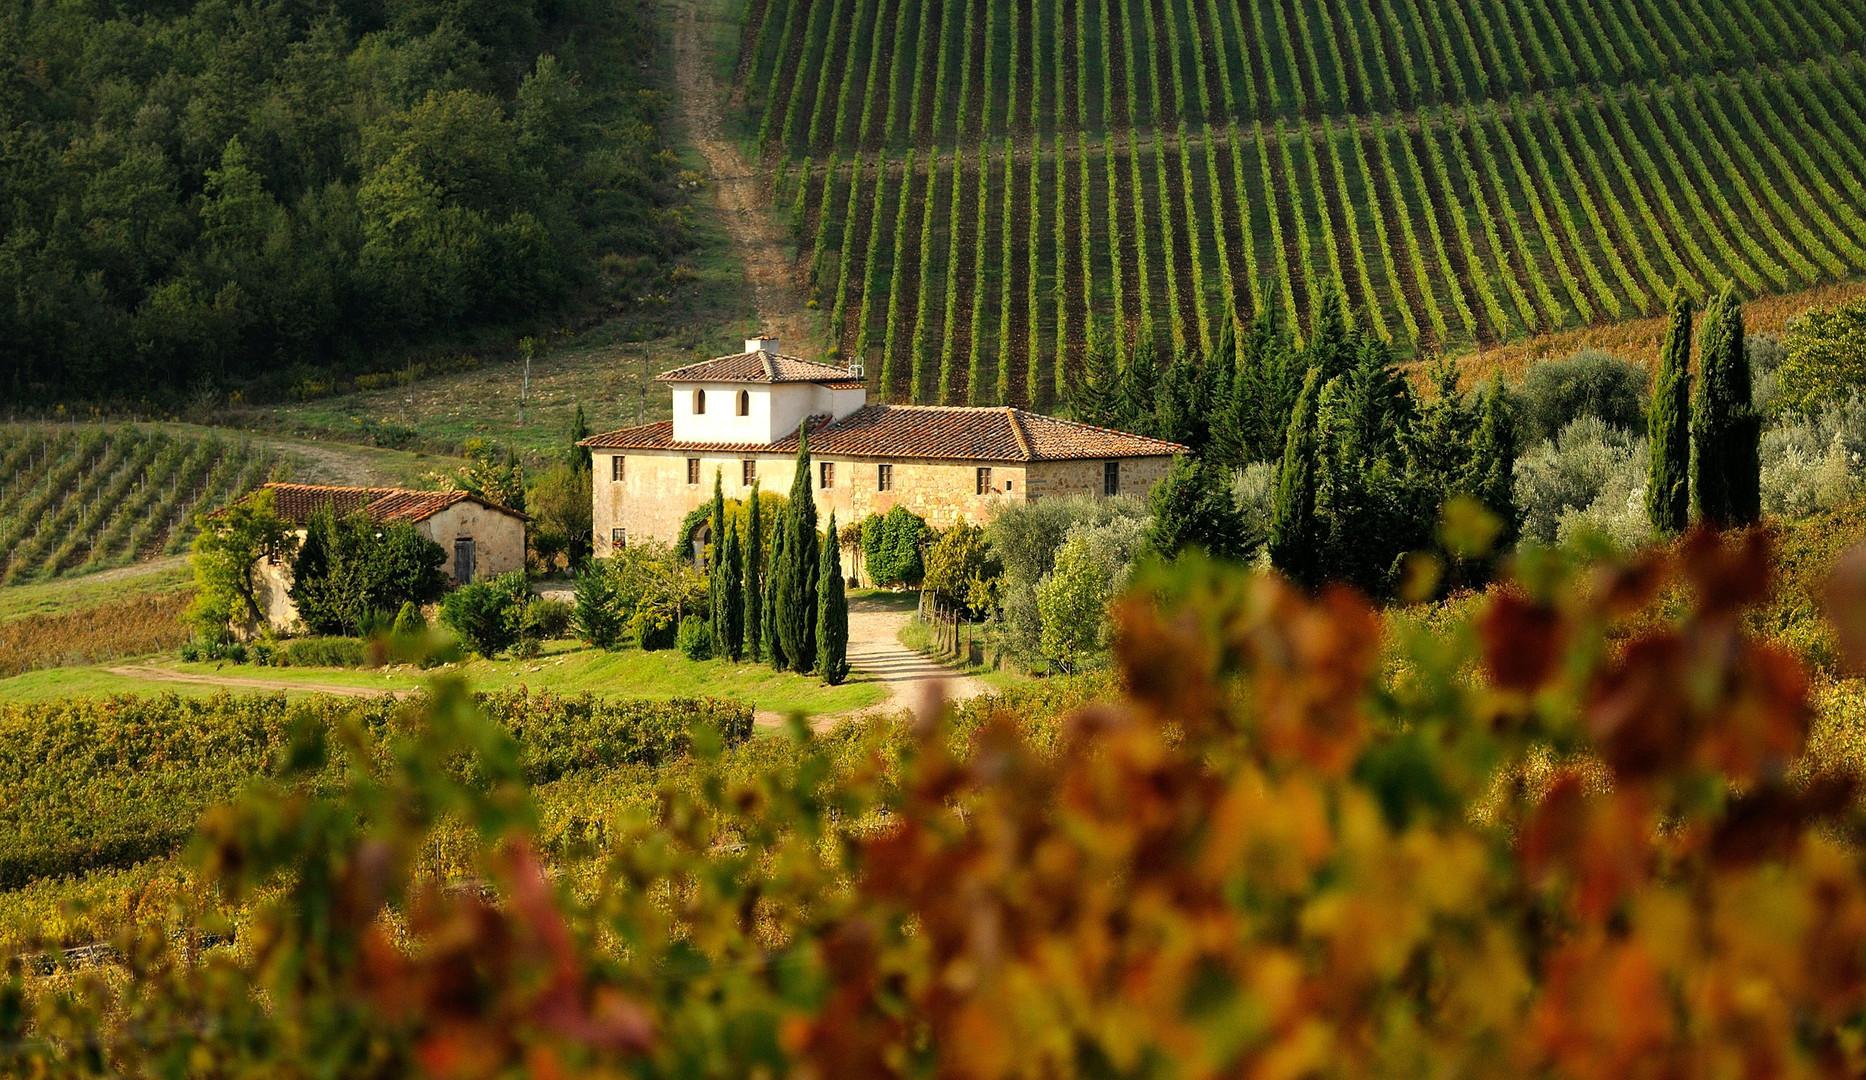 tuscany_chianti_499276306_crpd.jpg